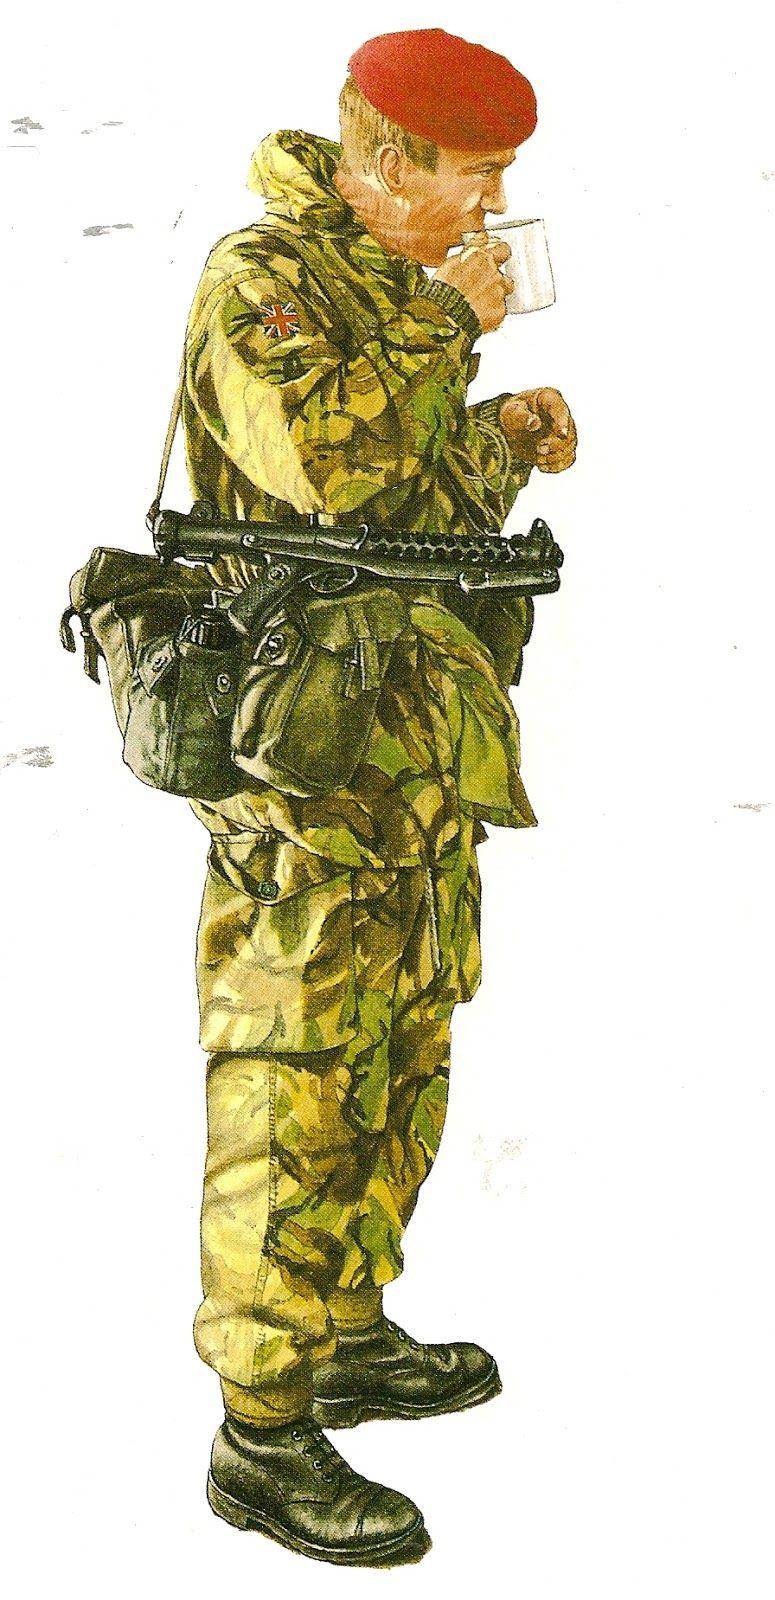 UNITED KINGDOM Sergeant Major parachute regiment